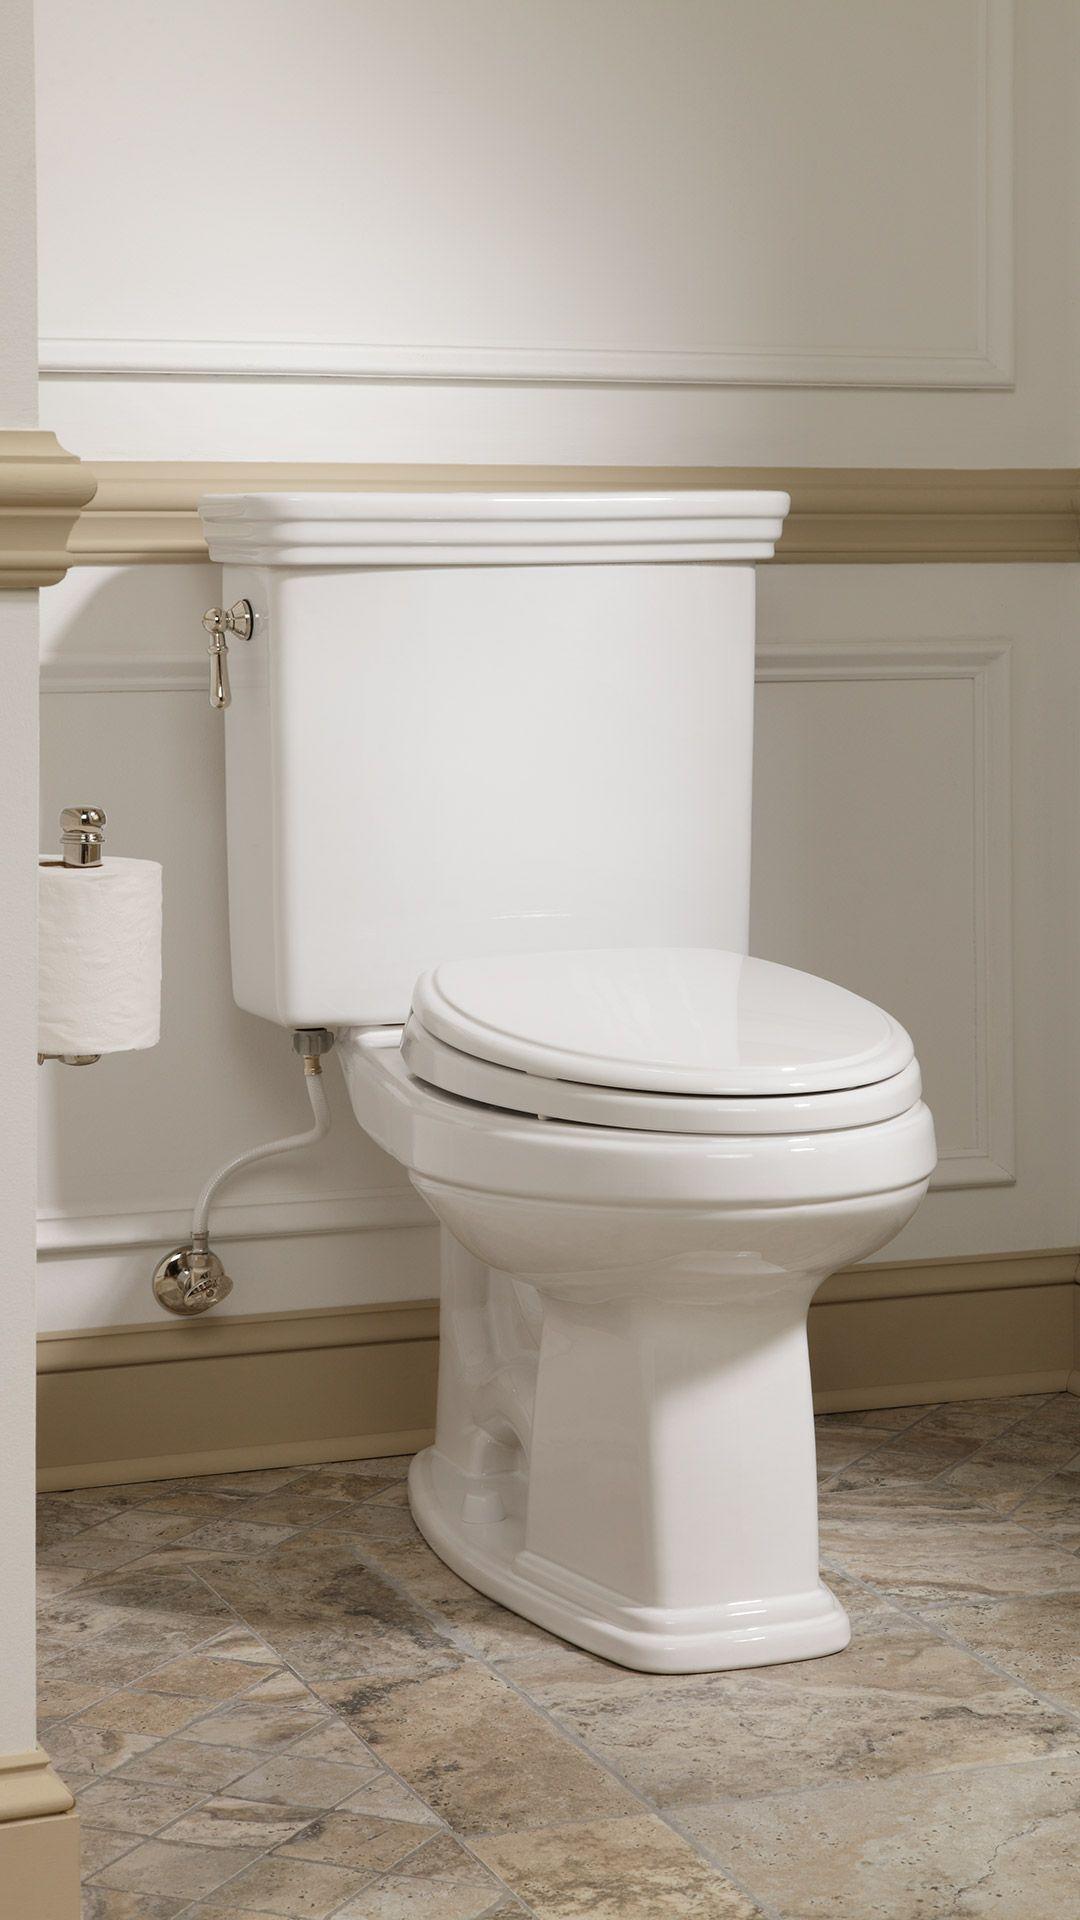 promenade two piece toilet 1 6 gpf elongated bowl. Black Bedroom Furniture Sets. Home Design Ideas